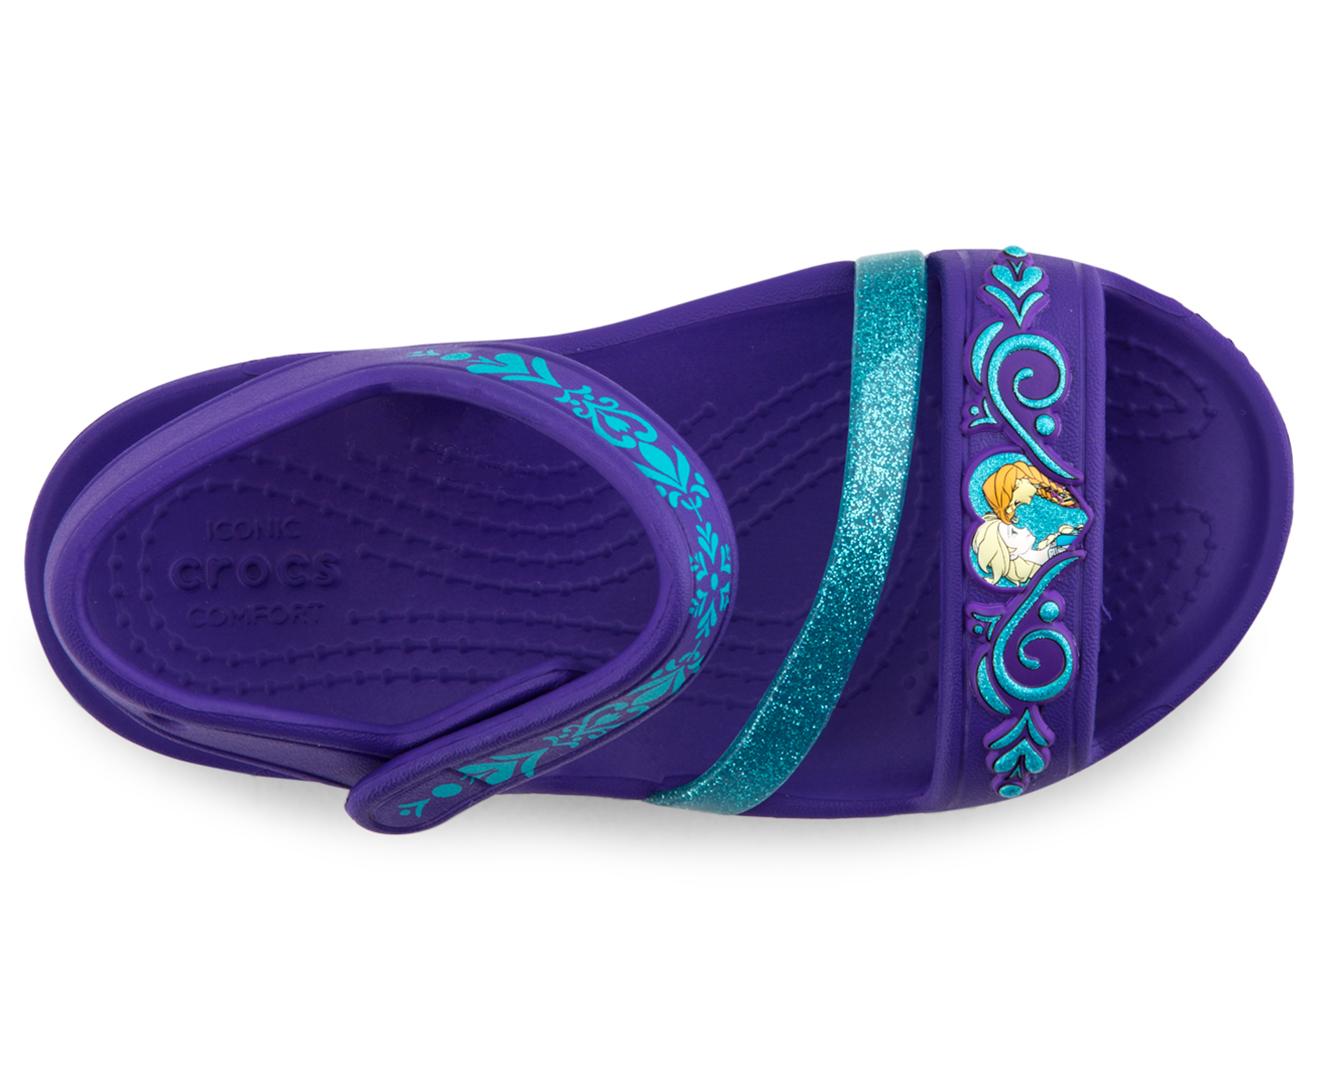 12162806608a Crocs Kids  Lina Frozen Sandal - Ultraviolet